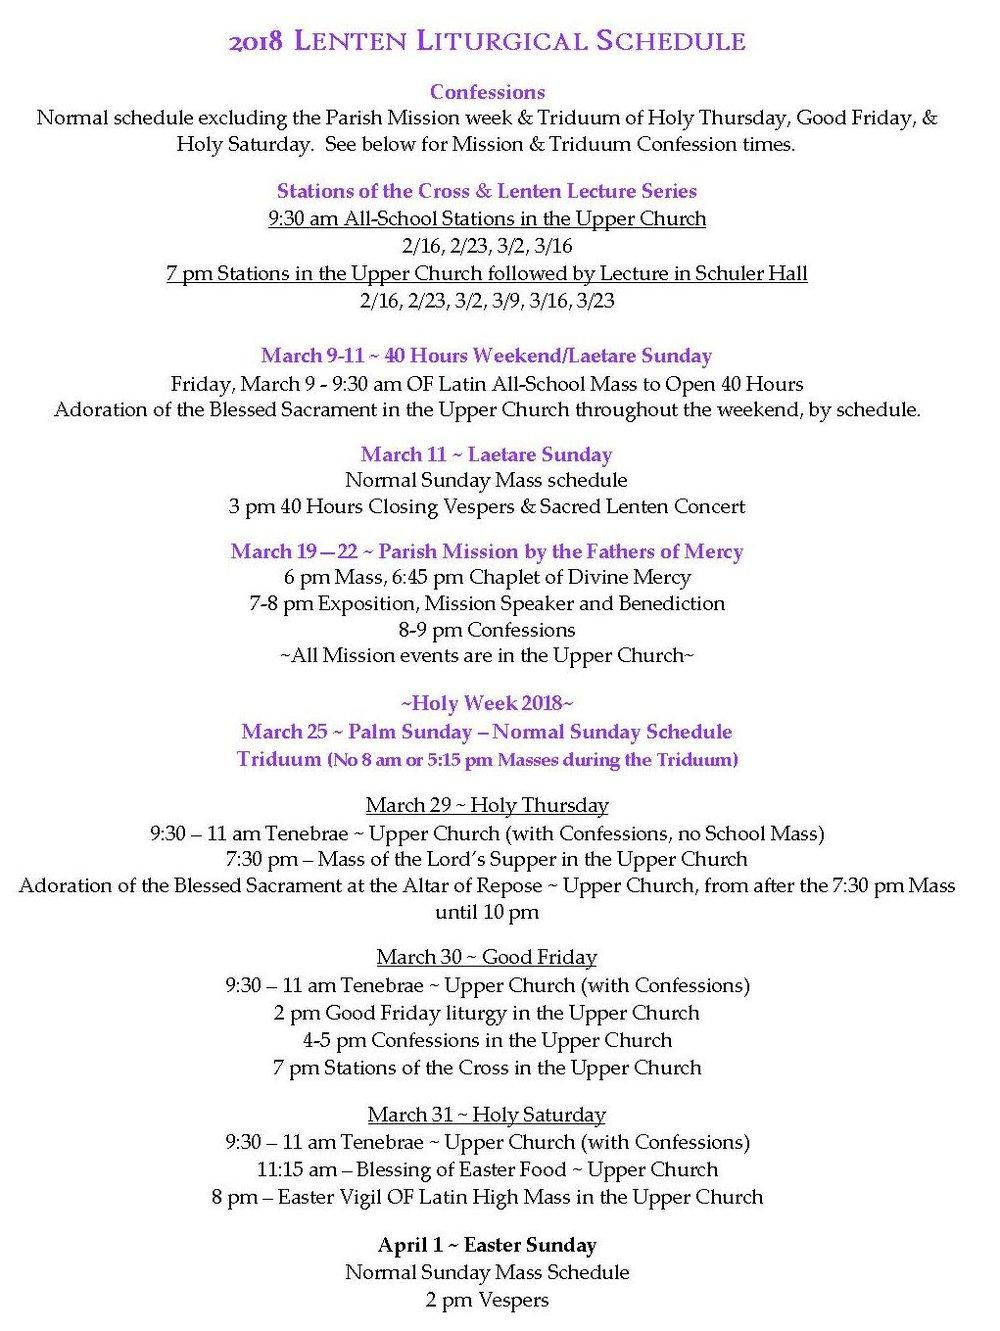 2018 Lenten Liturgical Schedule edited.jpg